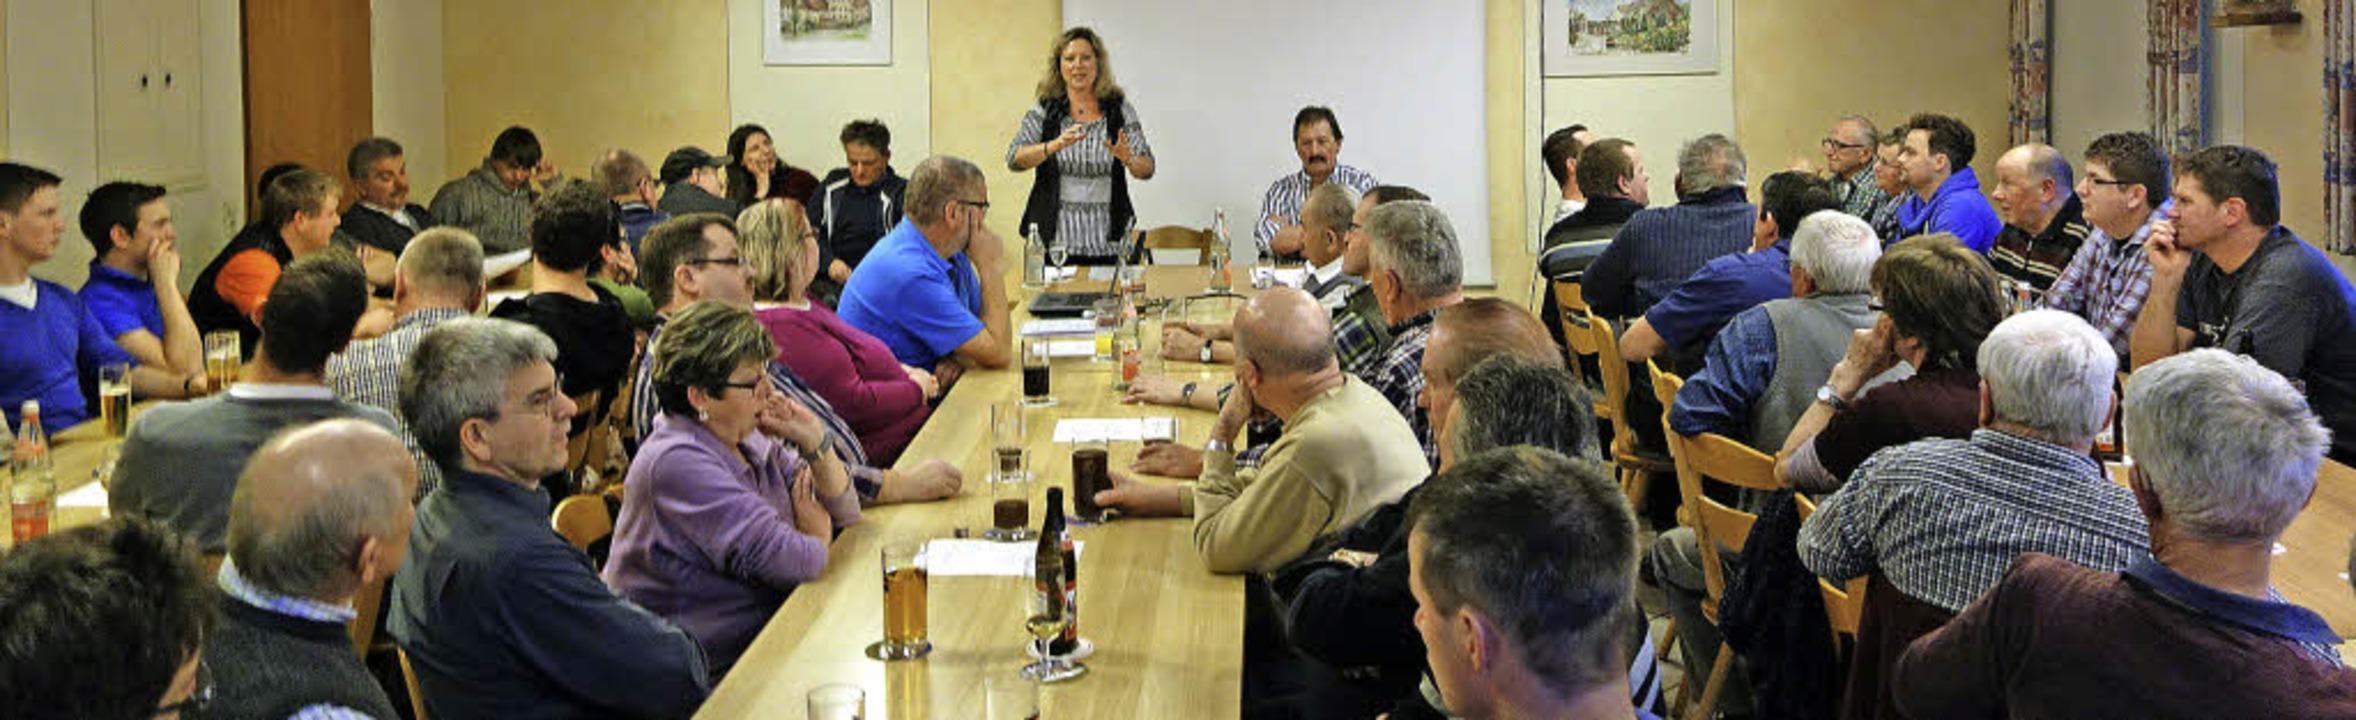 Bürgermeisterin Isolde Schäfer erläute...aushalt.                                  Foto: andreas mahler